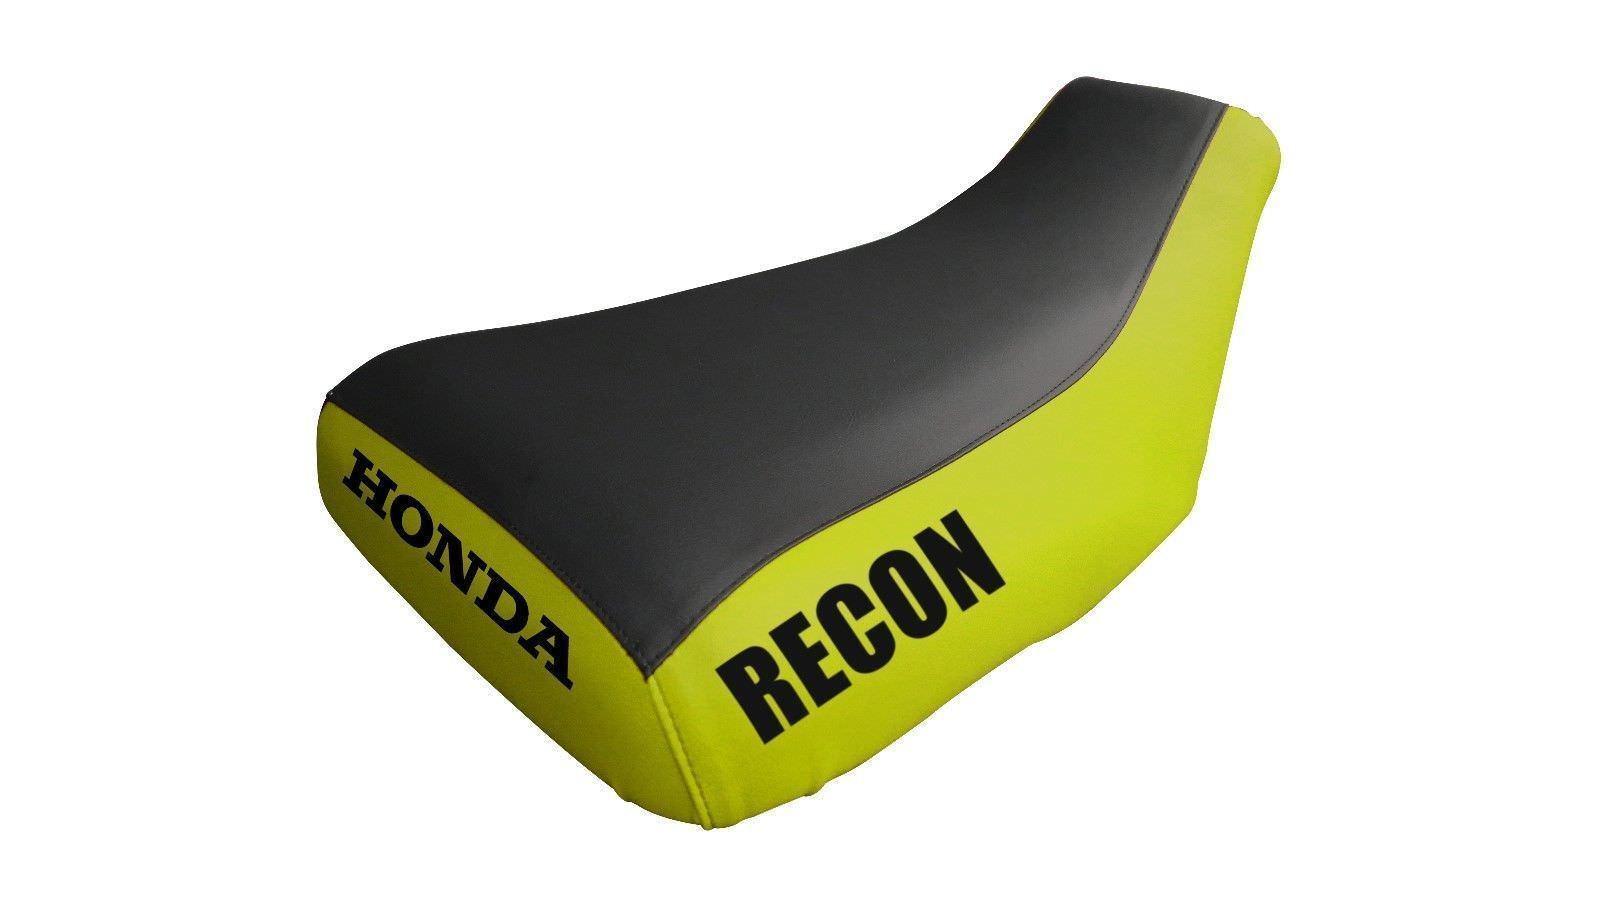 Honda Recon TRX250 2001-04 Logo Yellow Sides Seat Cover TG20181409